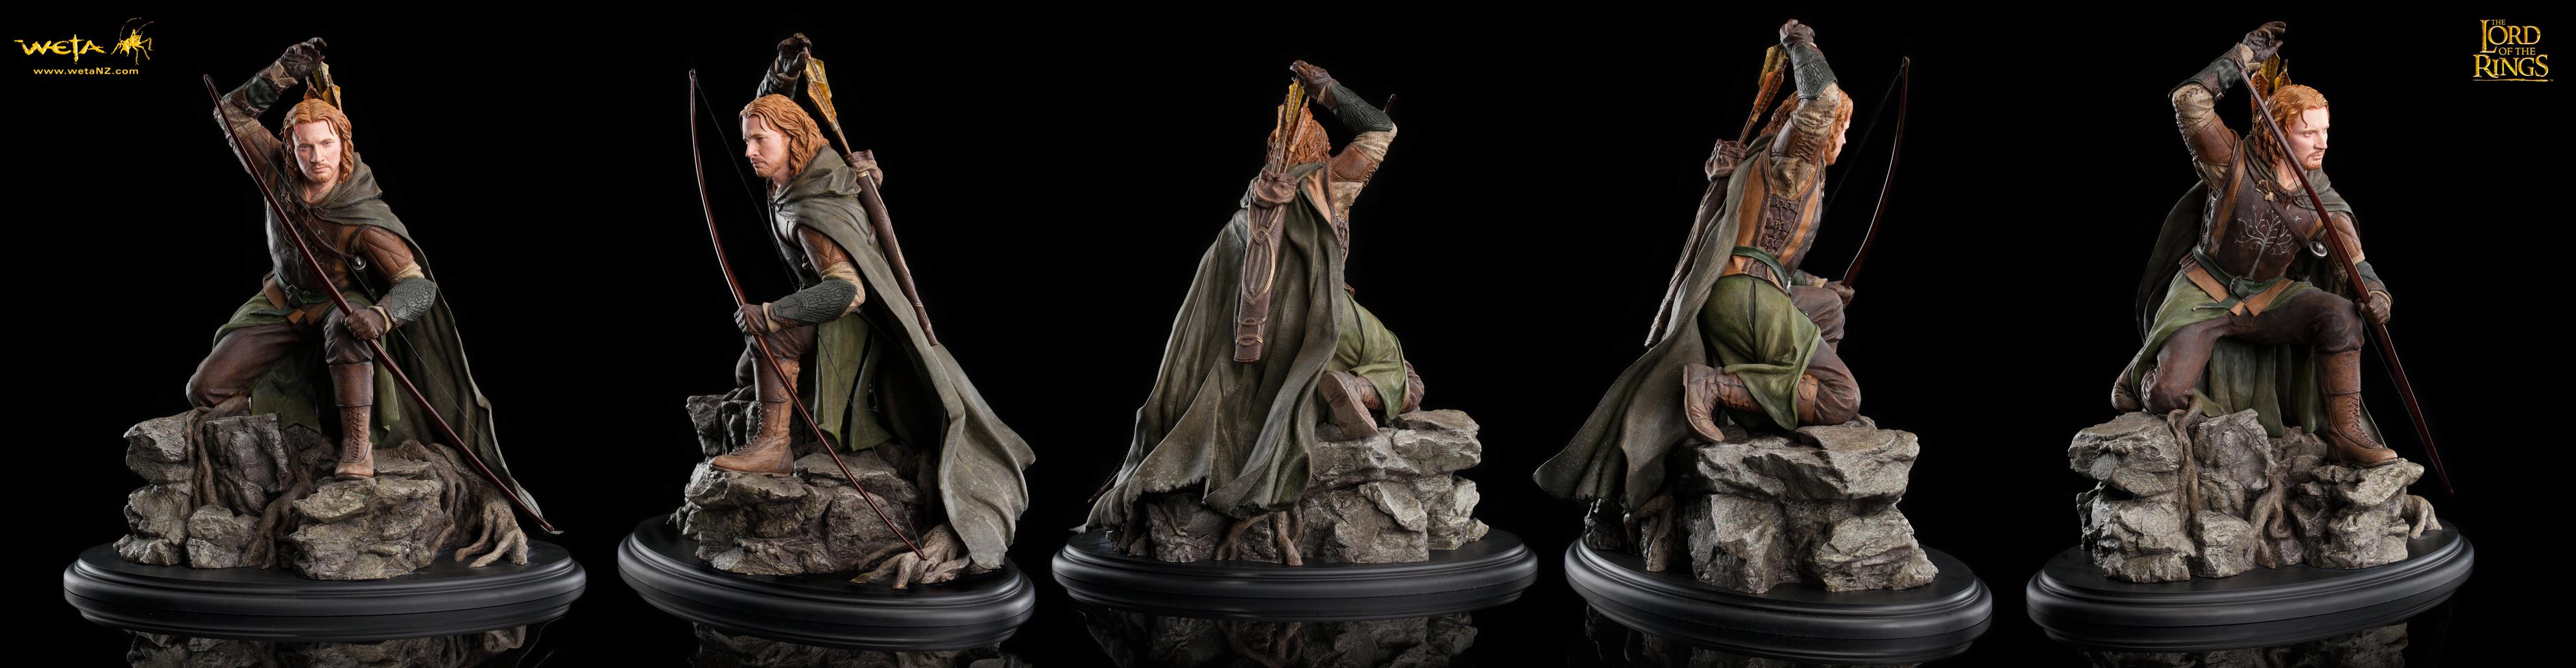 Weta Statuette Faramir